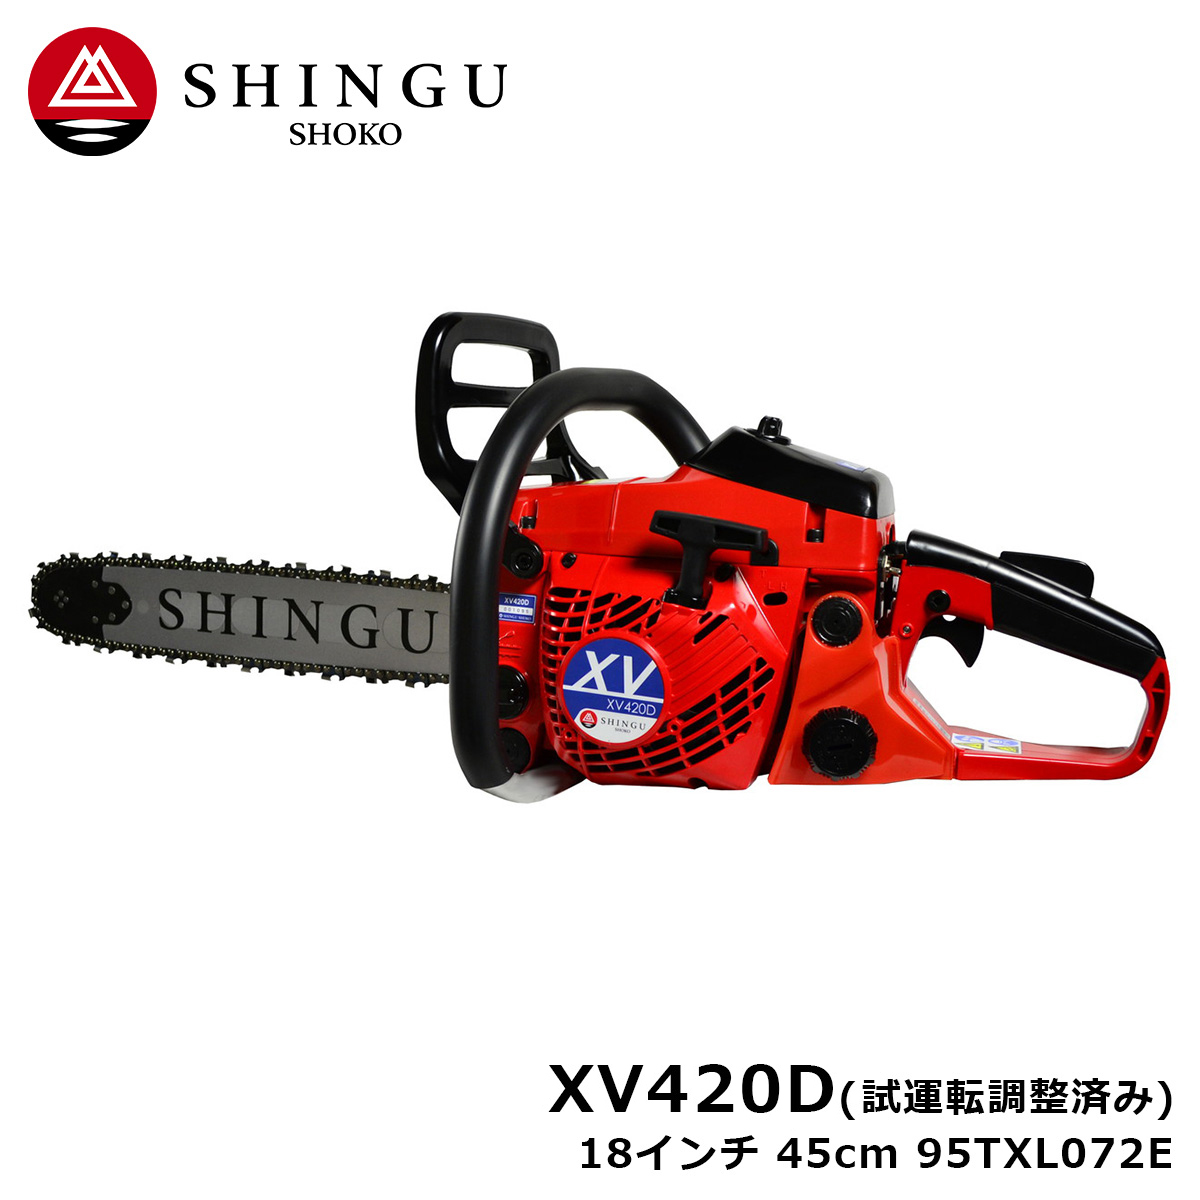 SHINGU XV420D エンジン式チェンソー チェーンソー 18インチ 45cm 95TXL 72E スプロケットノーズバー シングウ